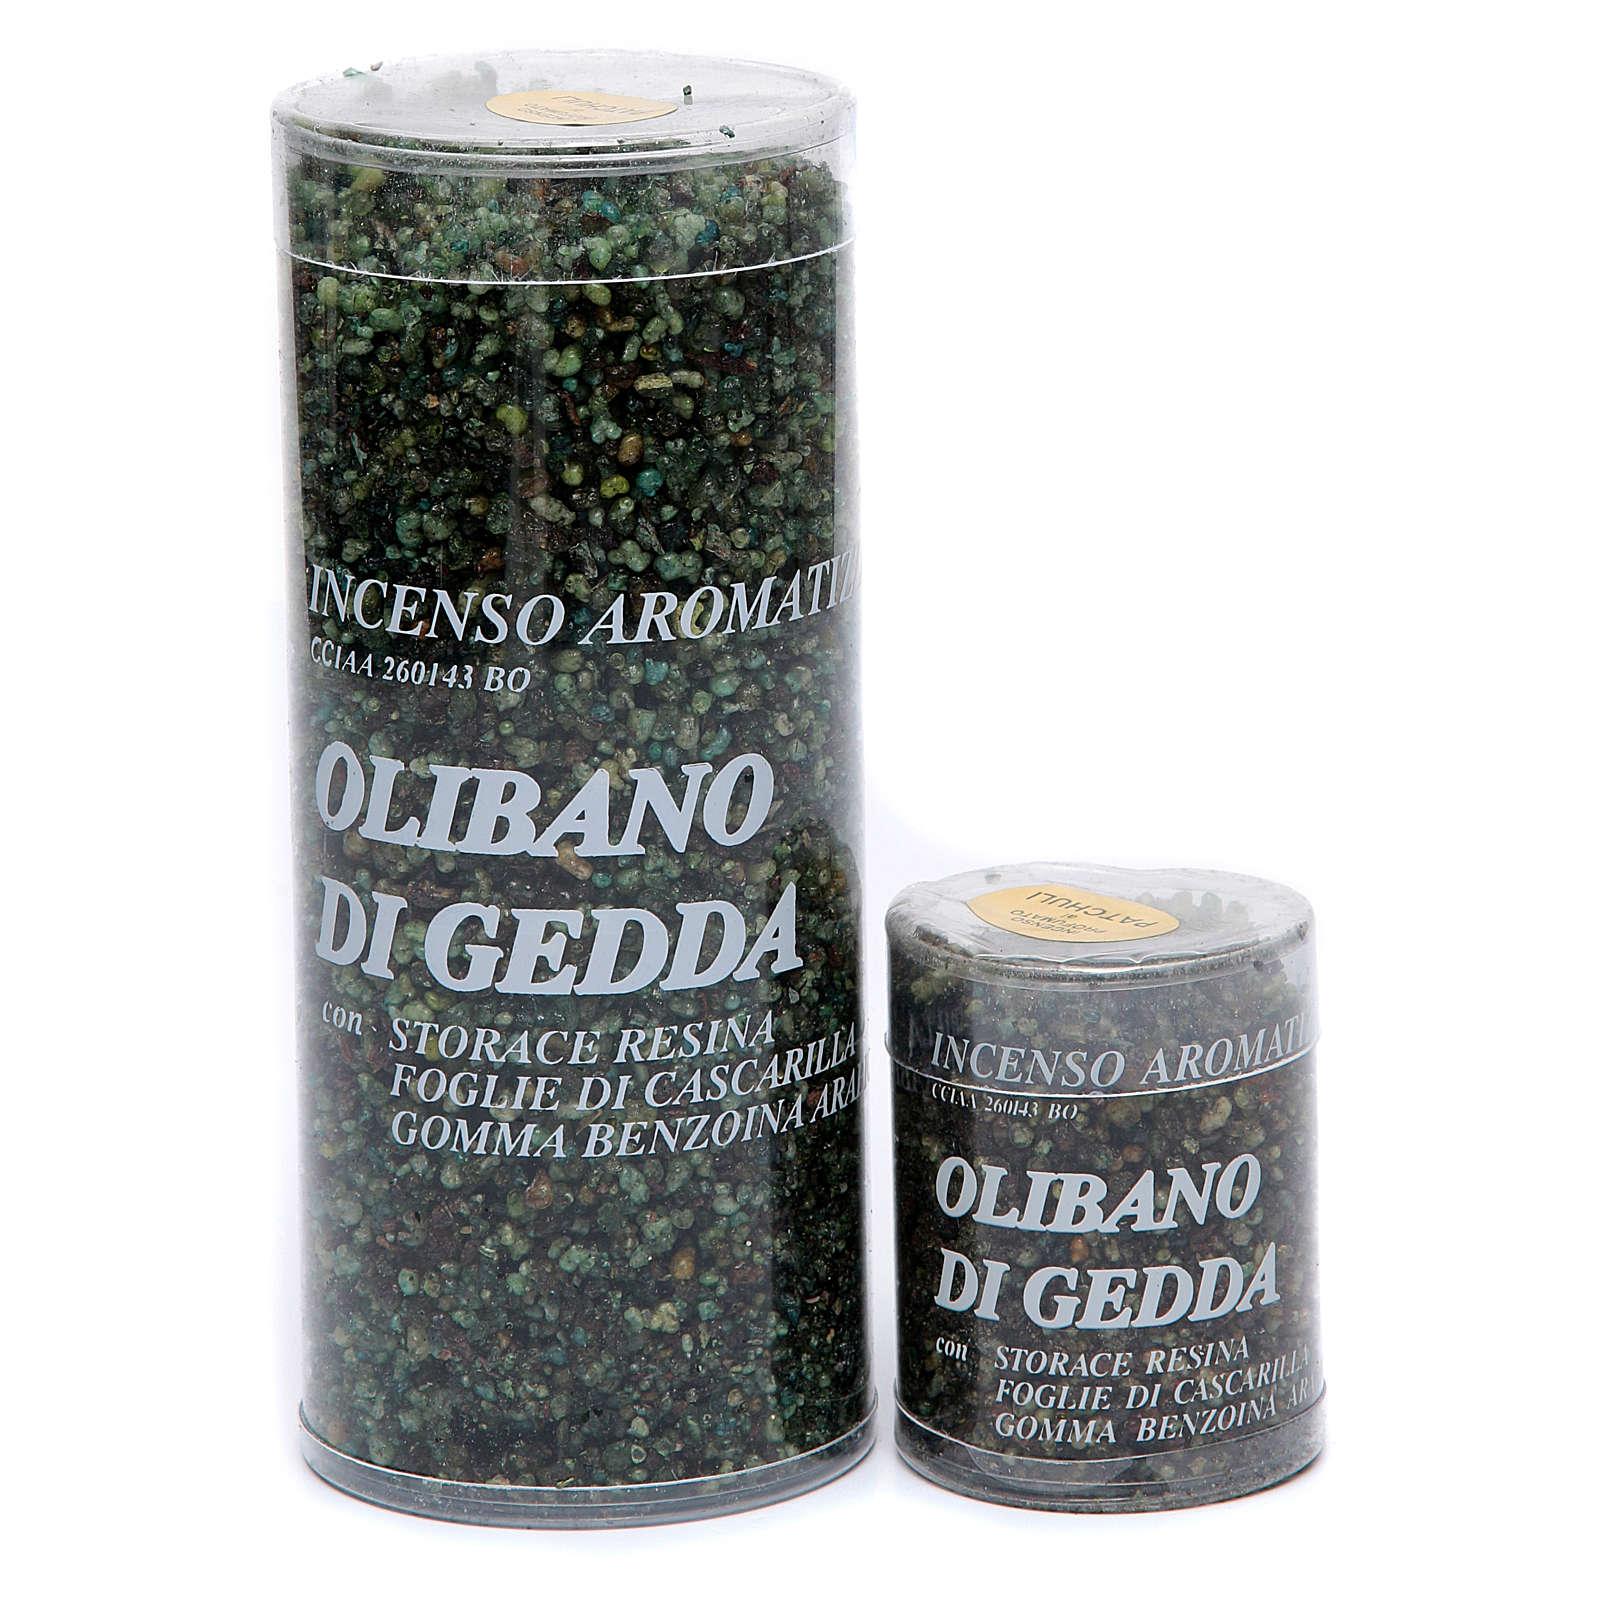 Incenso olibano di Gedda patchouli 3